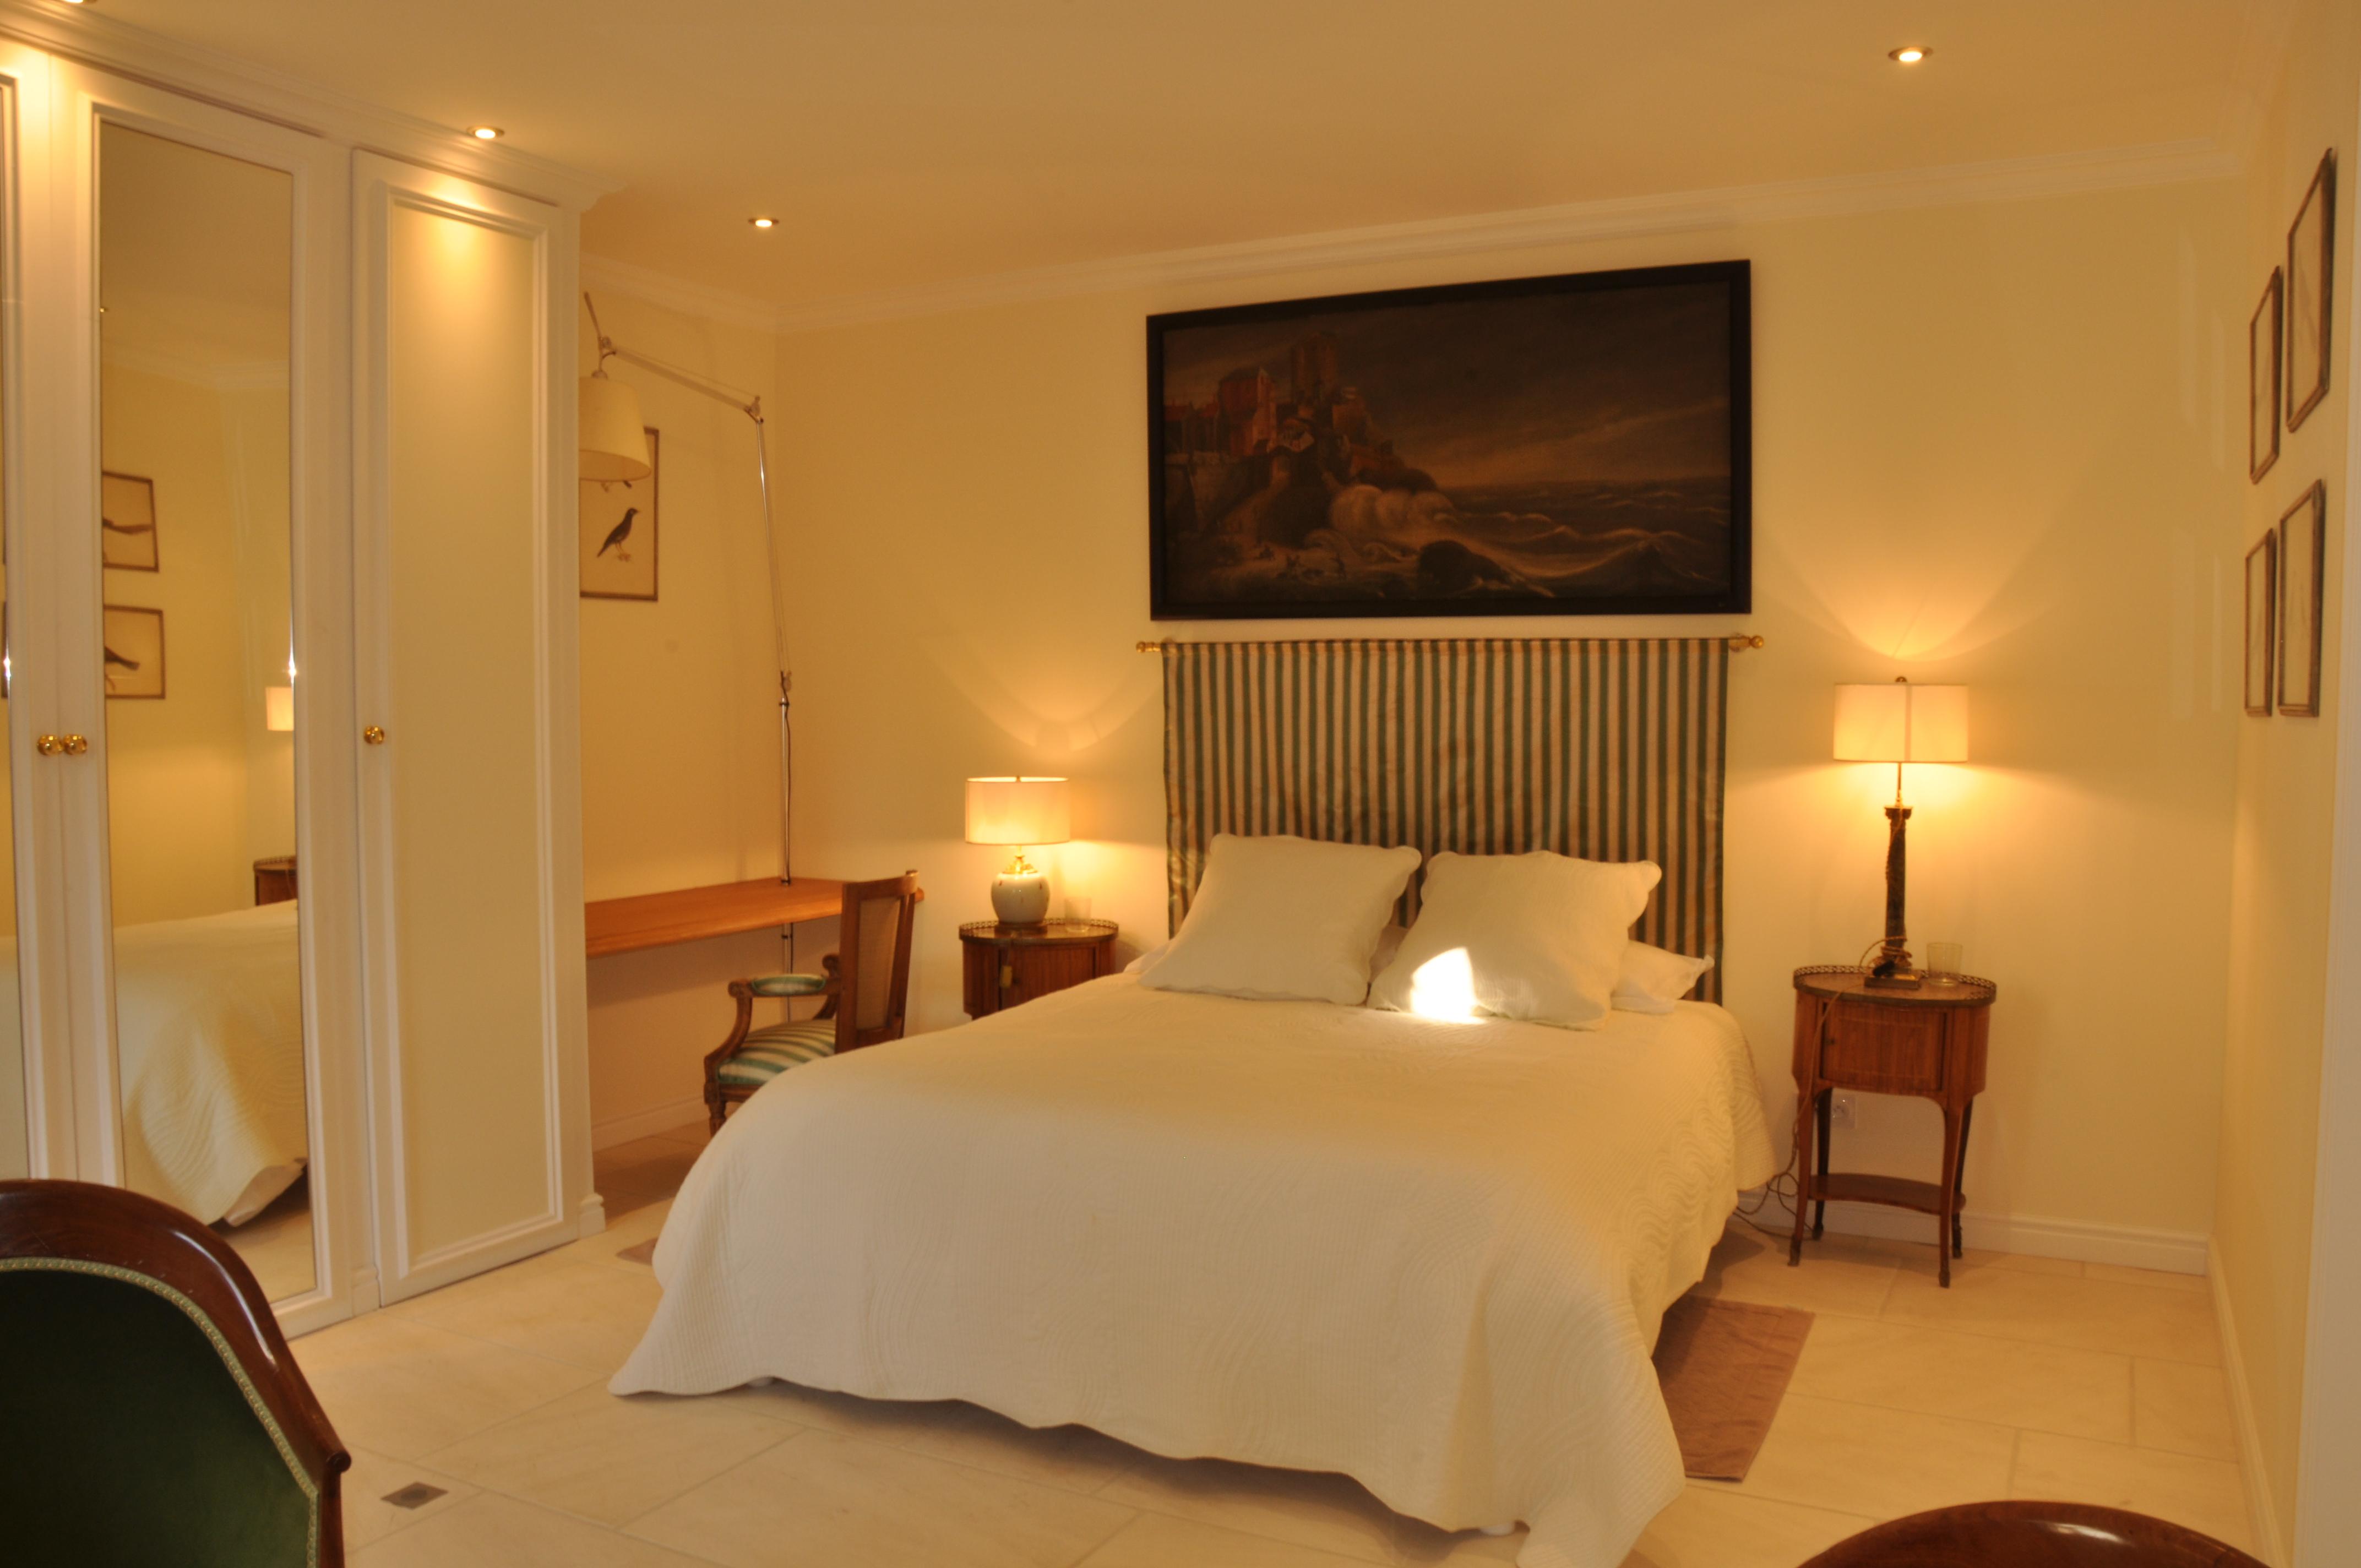 The Barn master bedroom